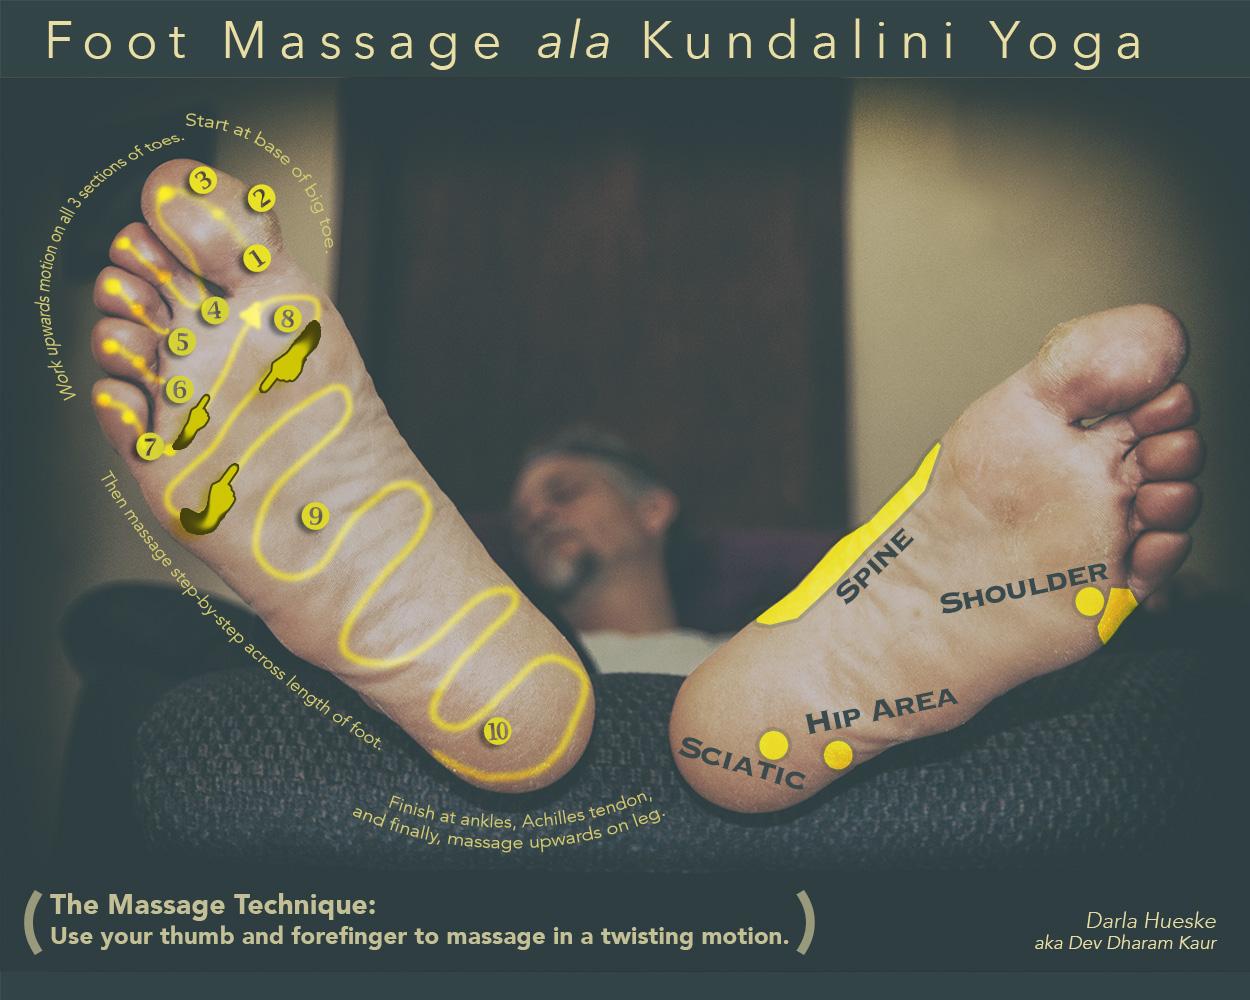 Yoga Everywhere Revolution Inward Kundalini Yoga Foot Massage